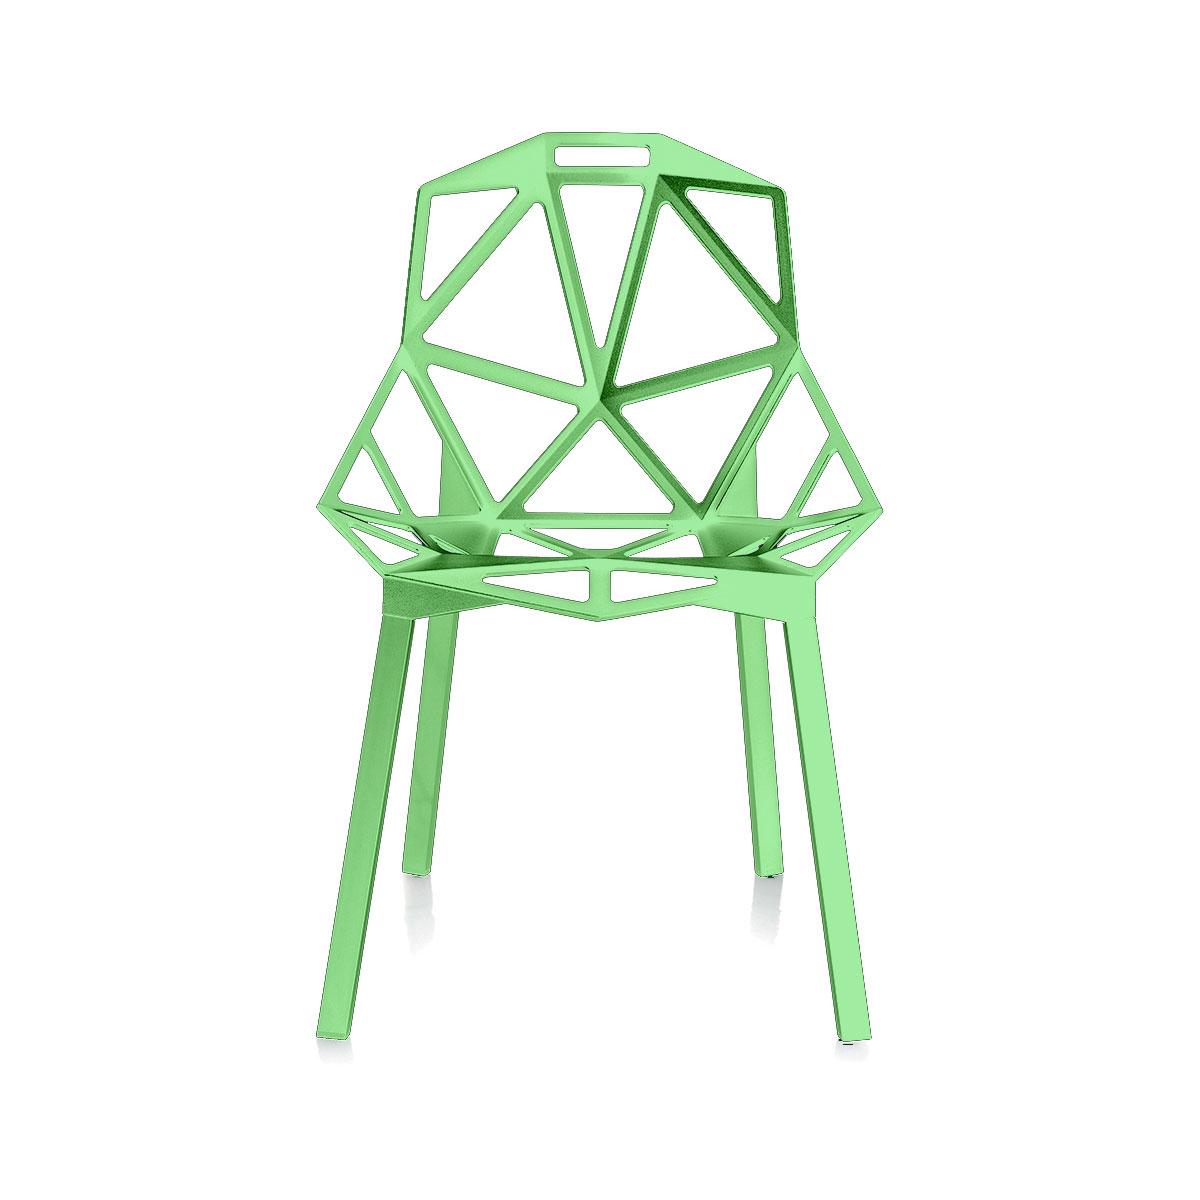 konstantin-grcic-chair-one